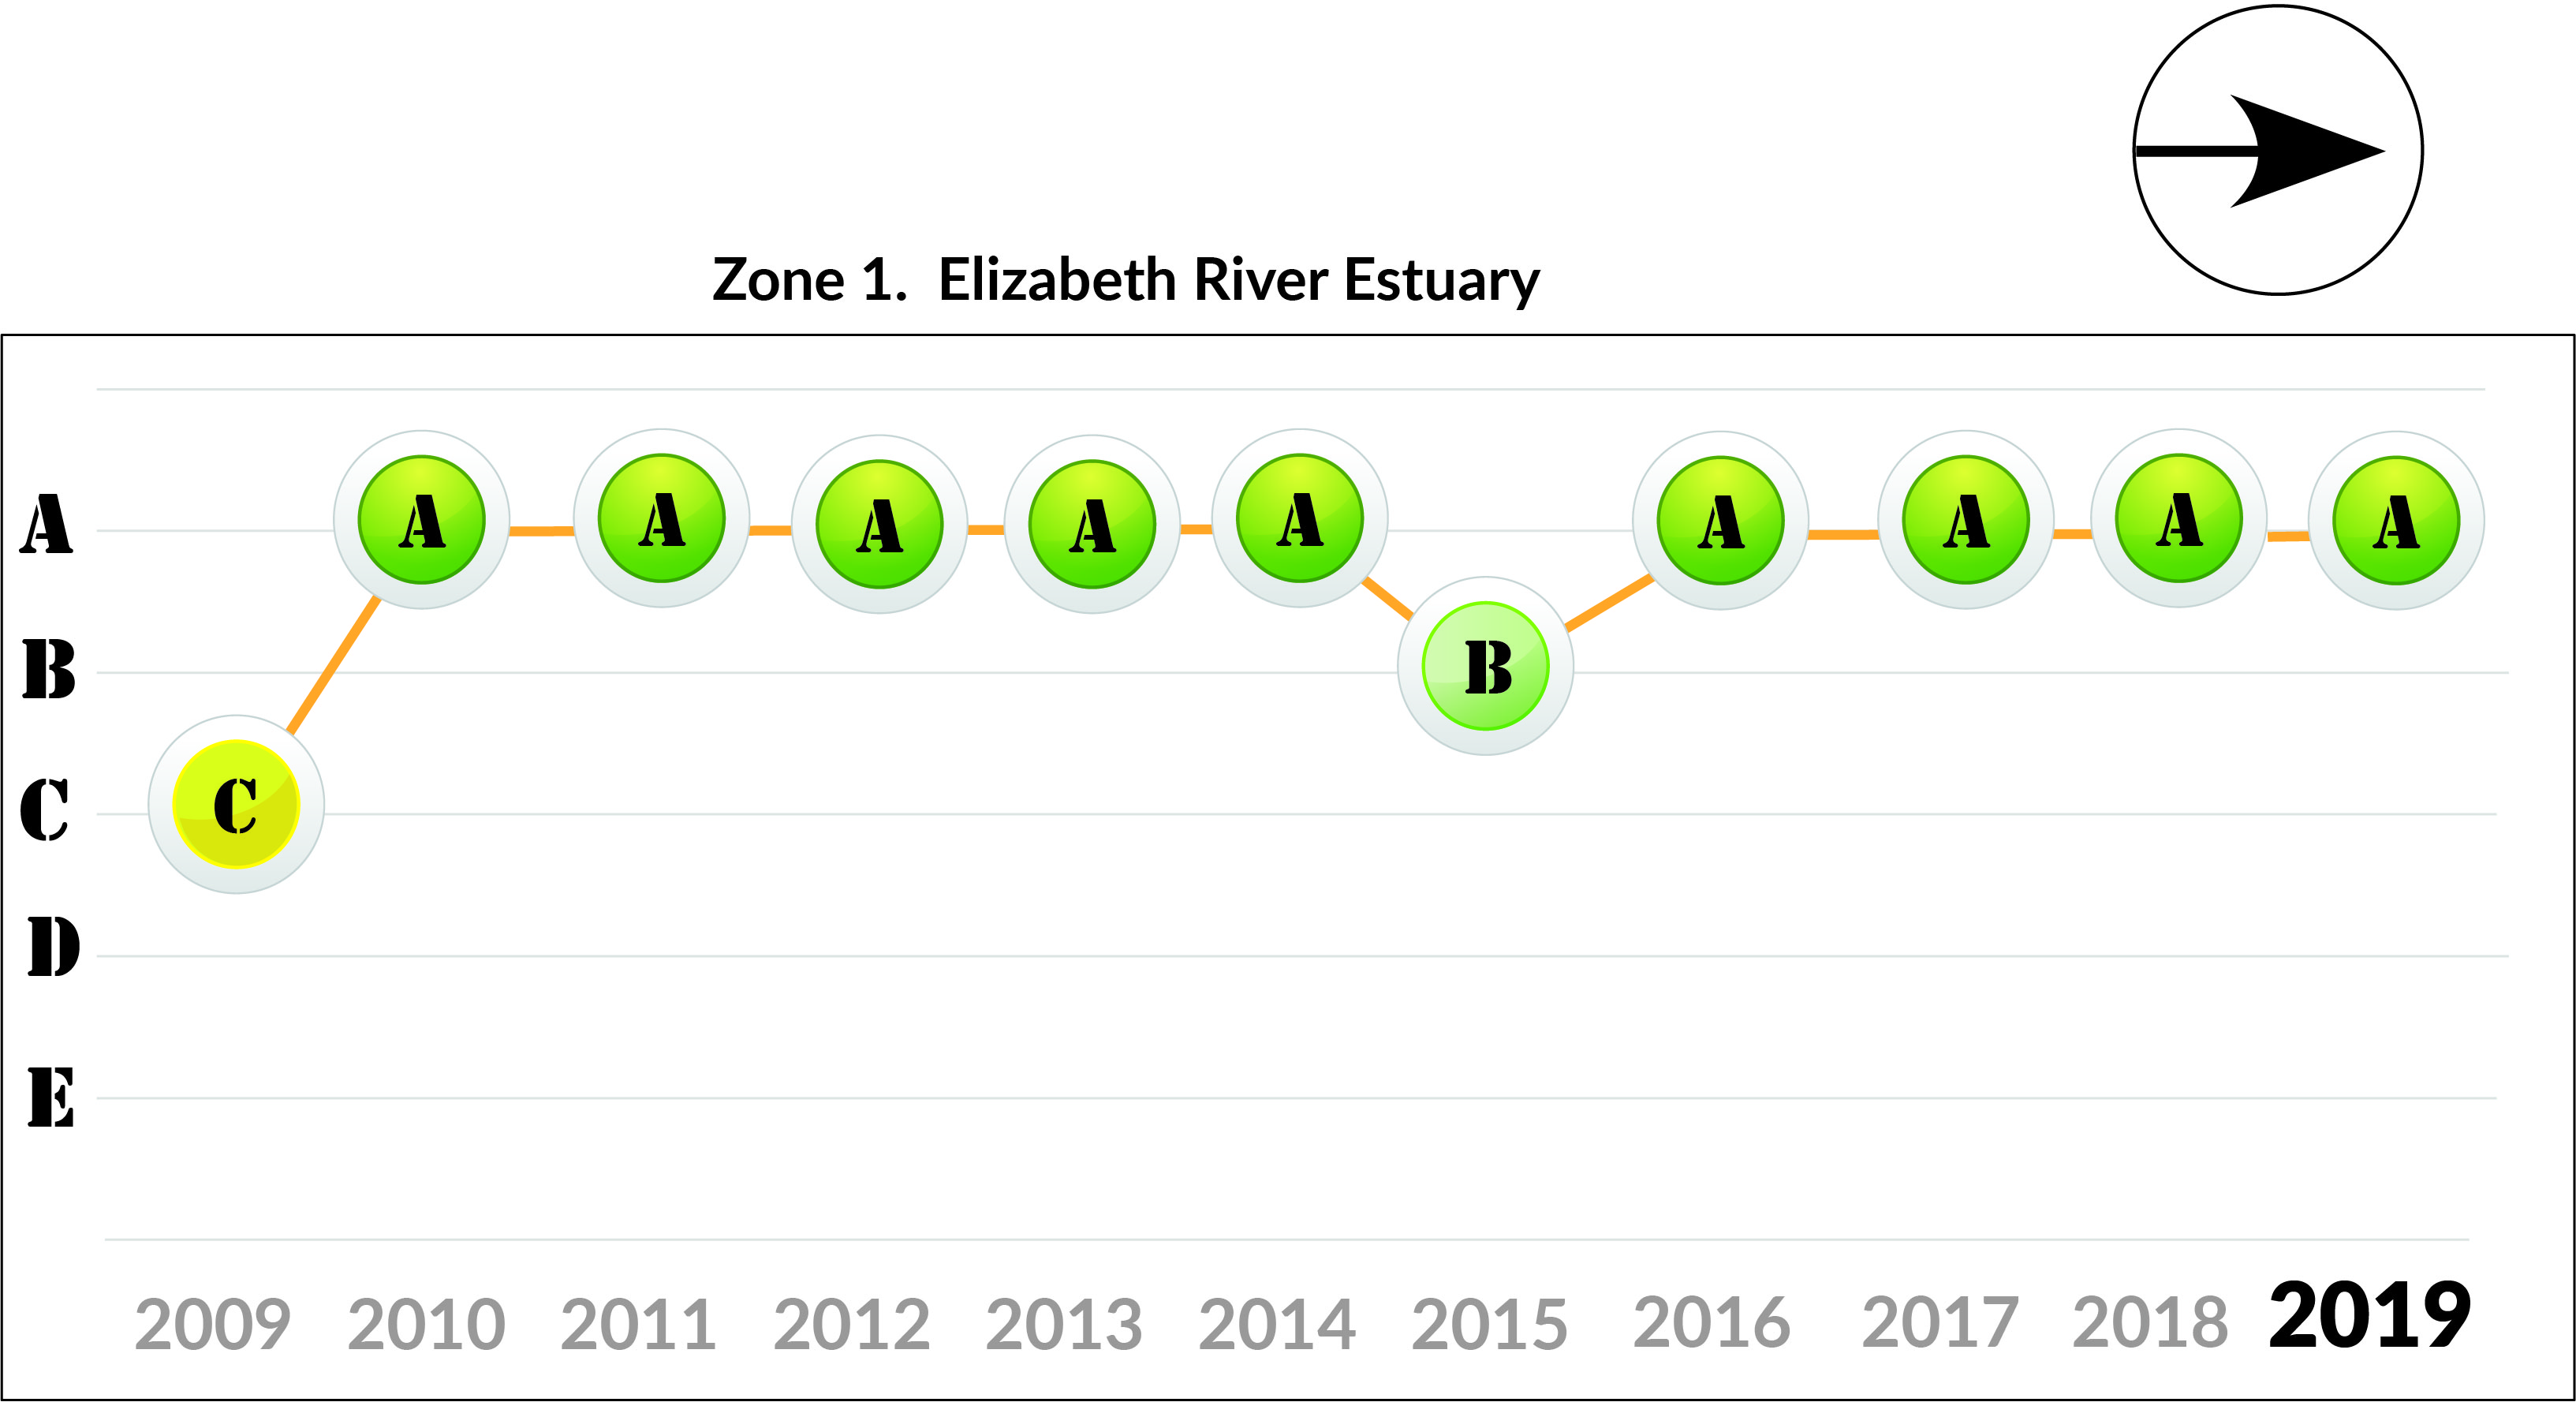 Zone 1 Elizabeth River trends